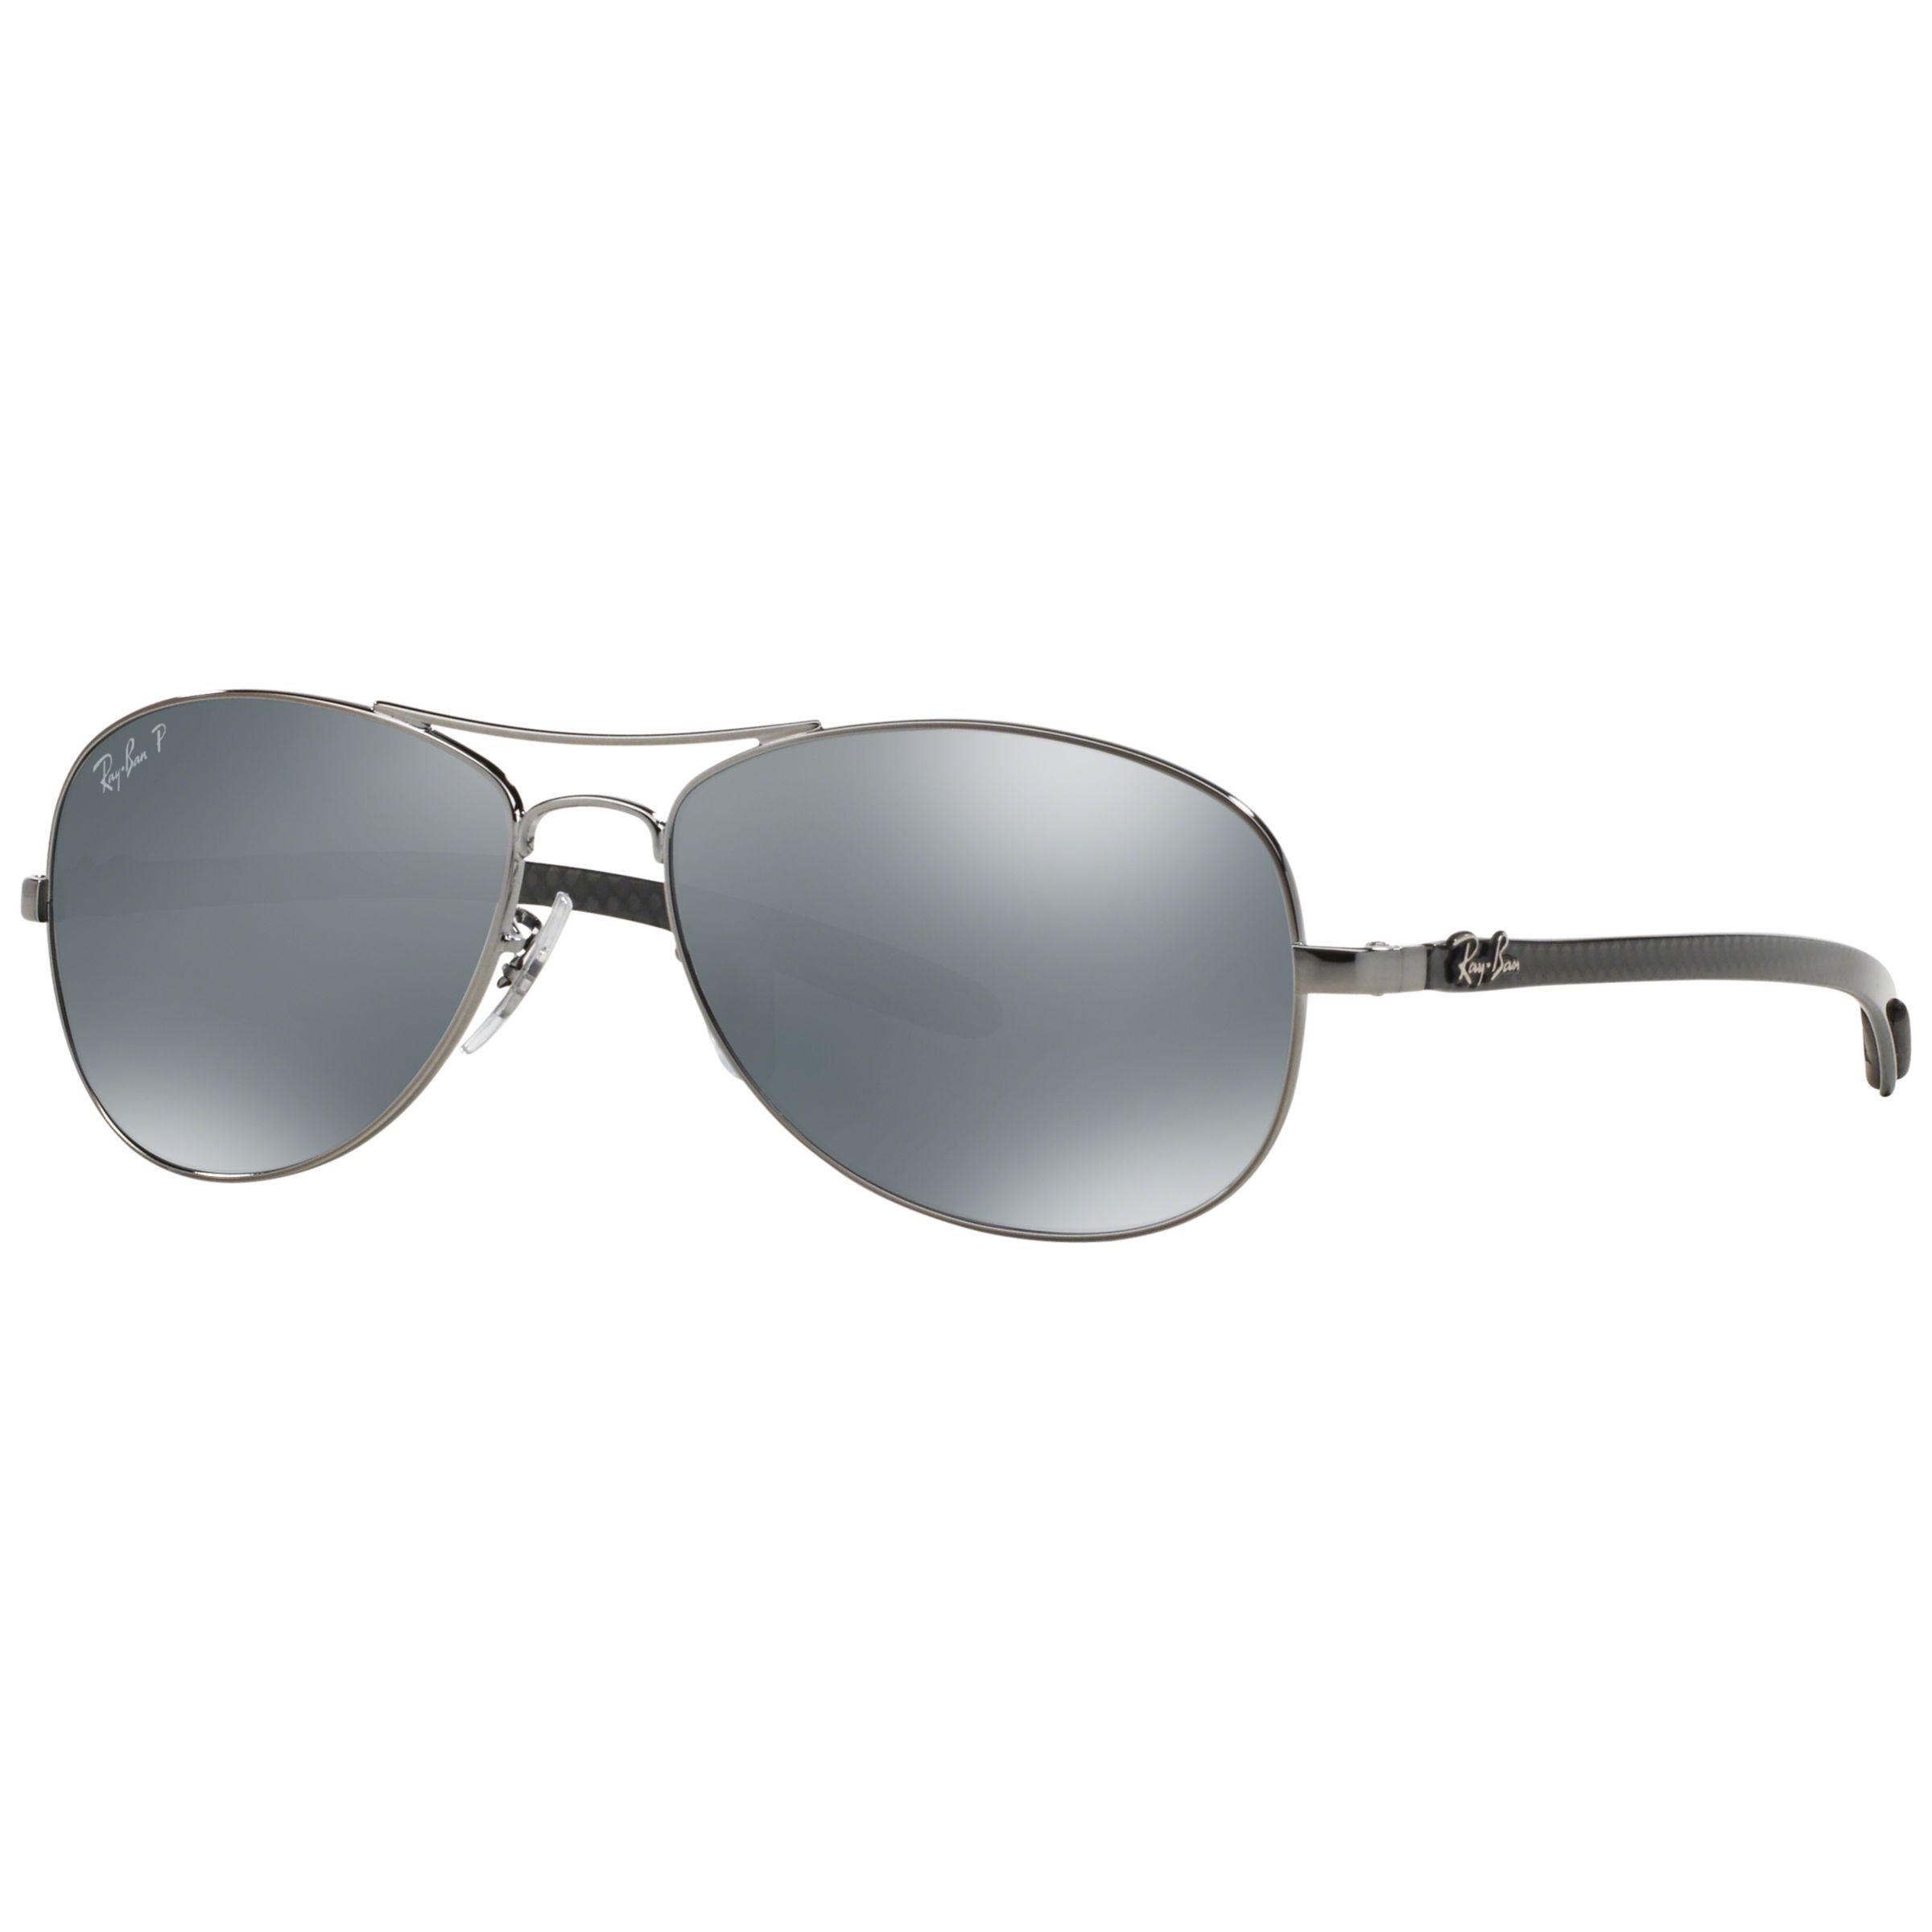 16e46d2dcf Ray-Ban RB8301 Polarised Carbon Fibre Pilot Sunglasses